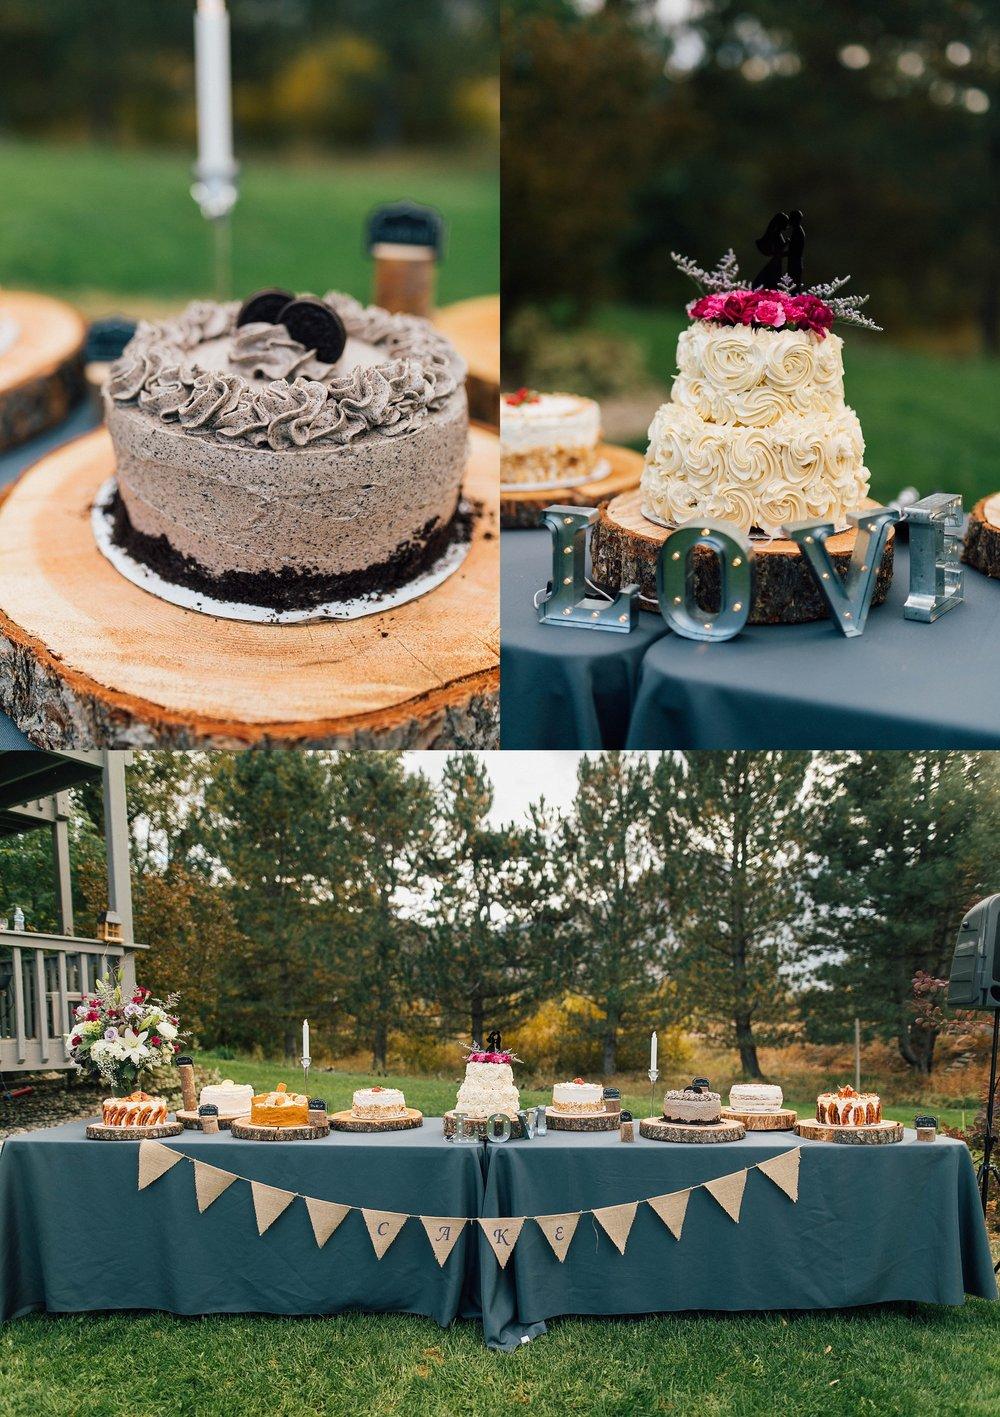 ashley_vos_seattle_ wedding_photographer_0236.jpg